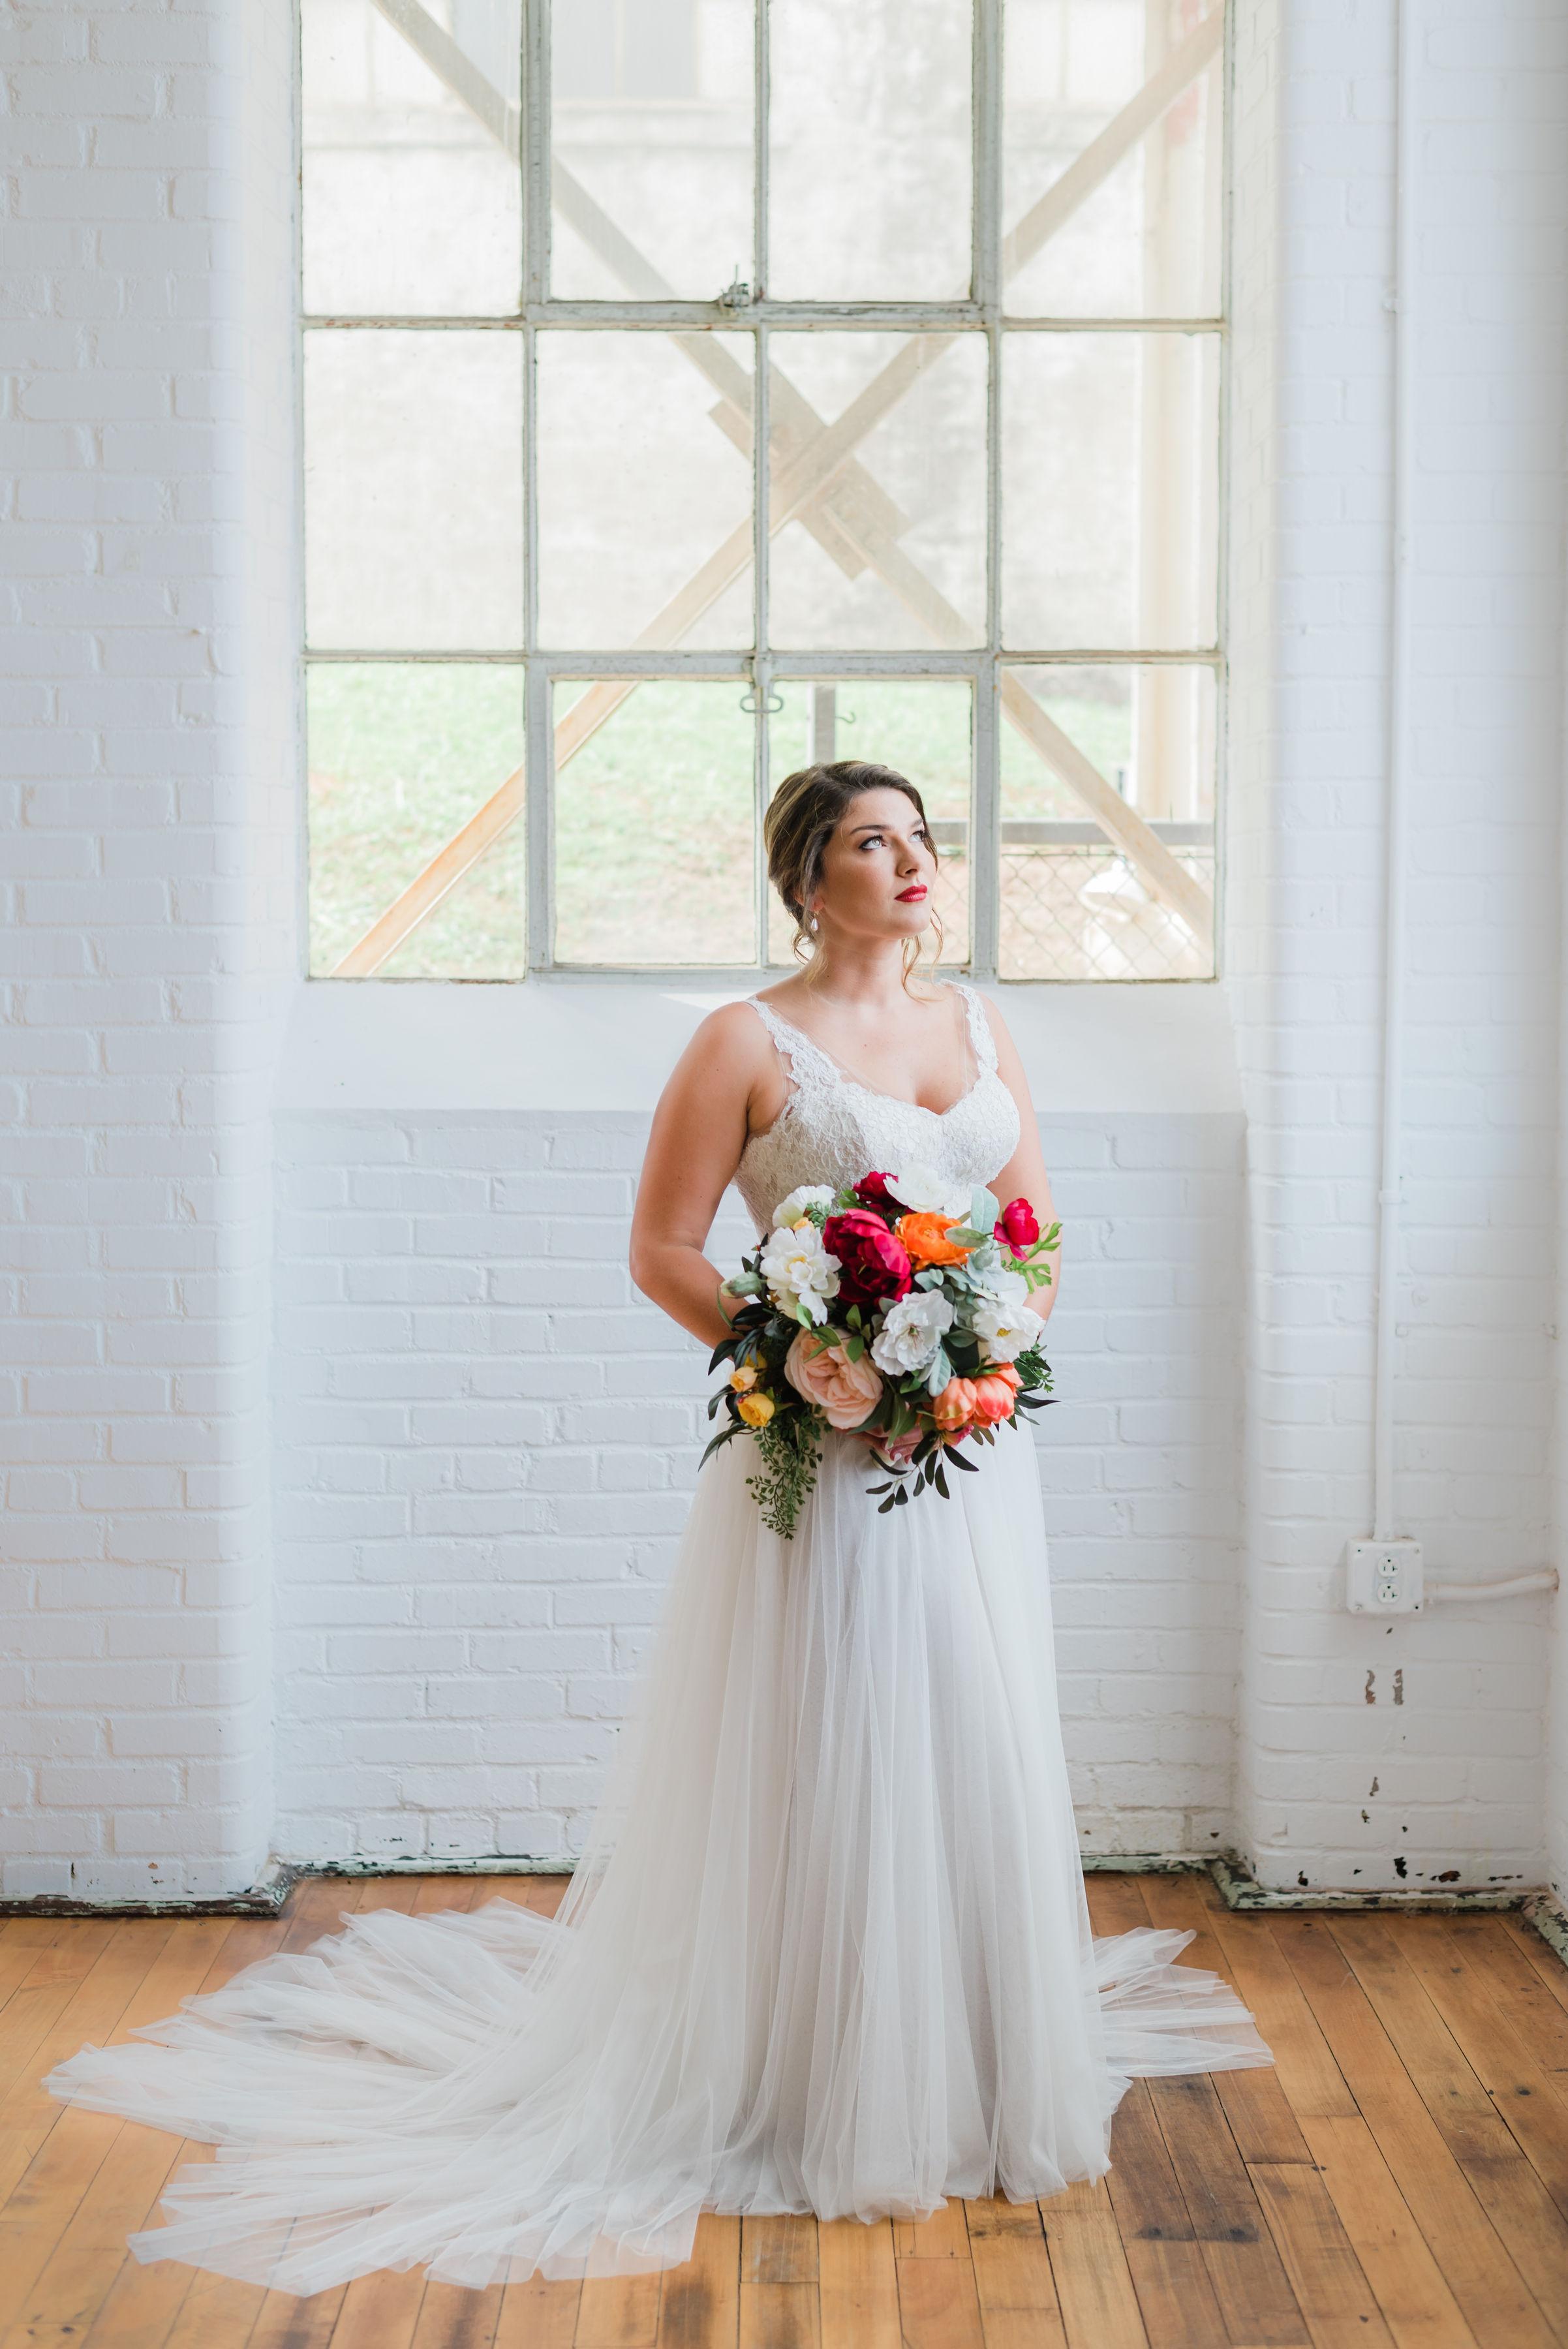 TaylorAdams_bridals-1.jpg